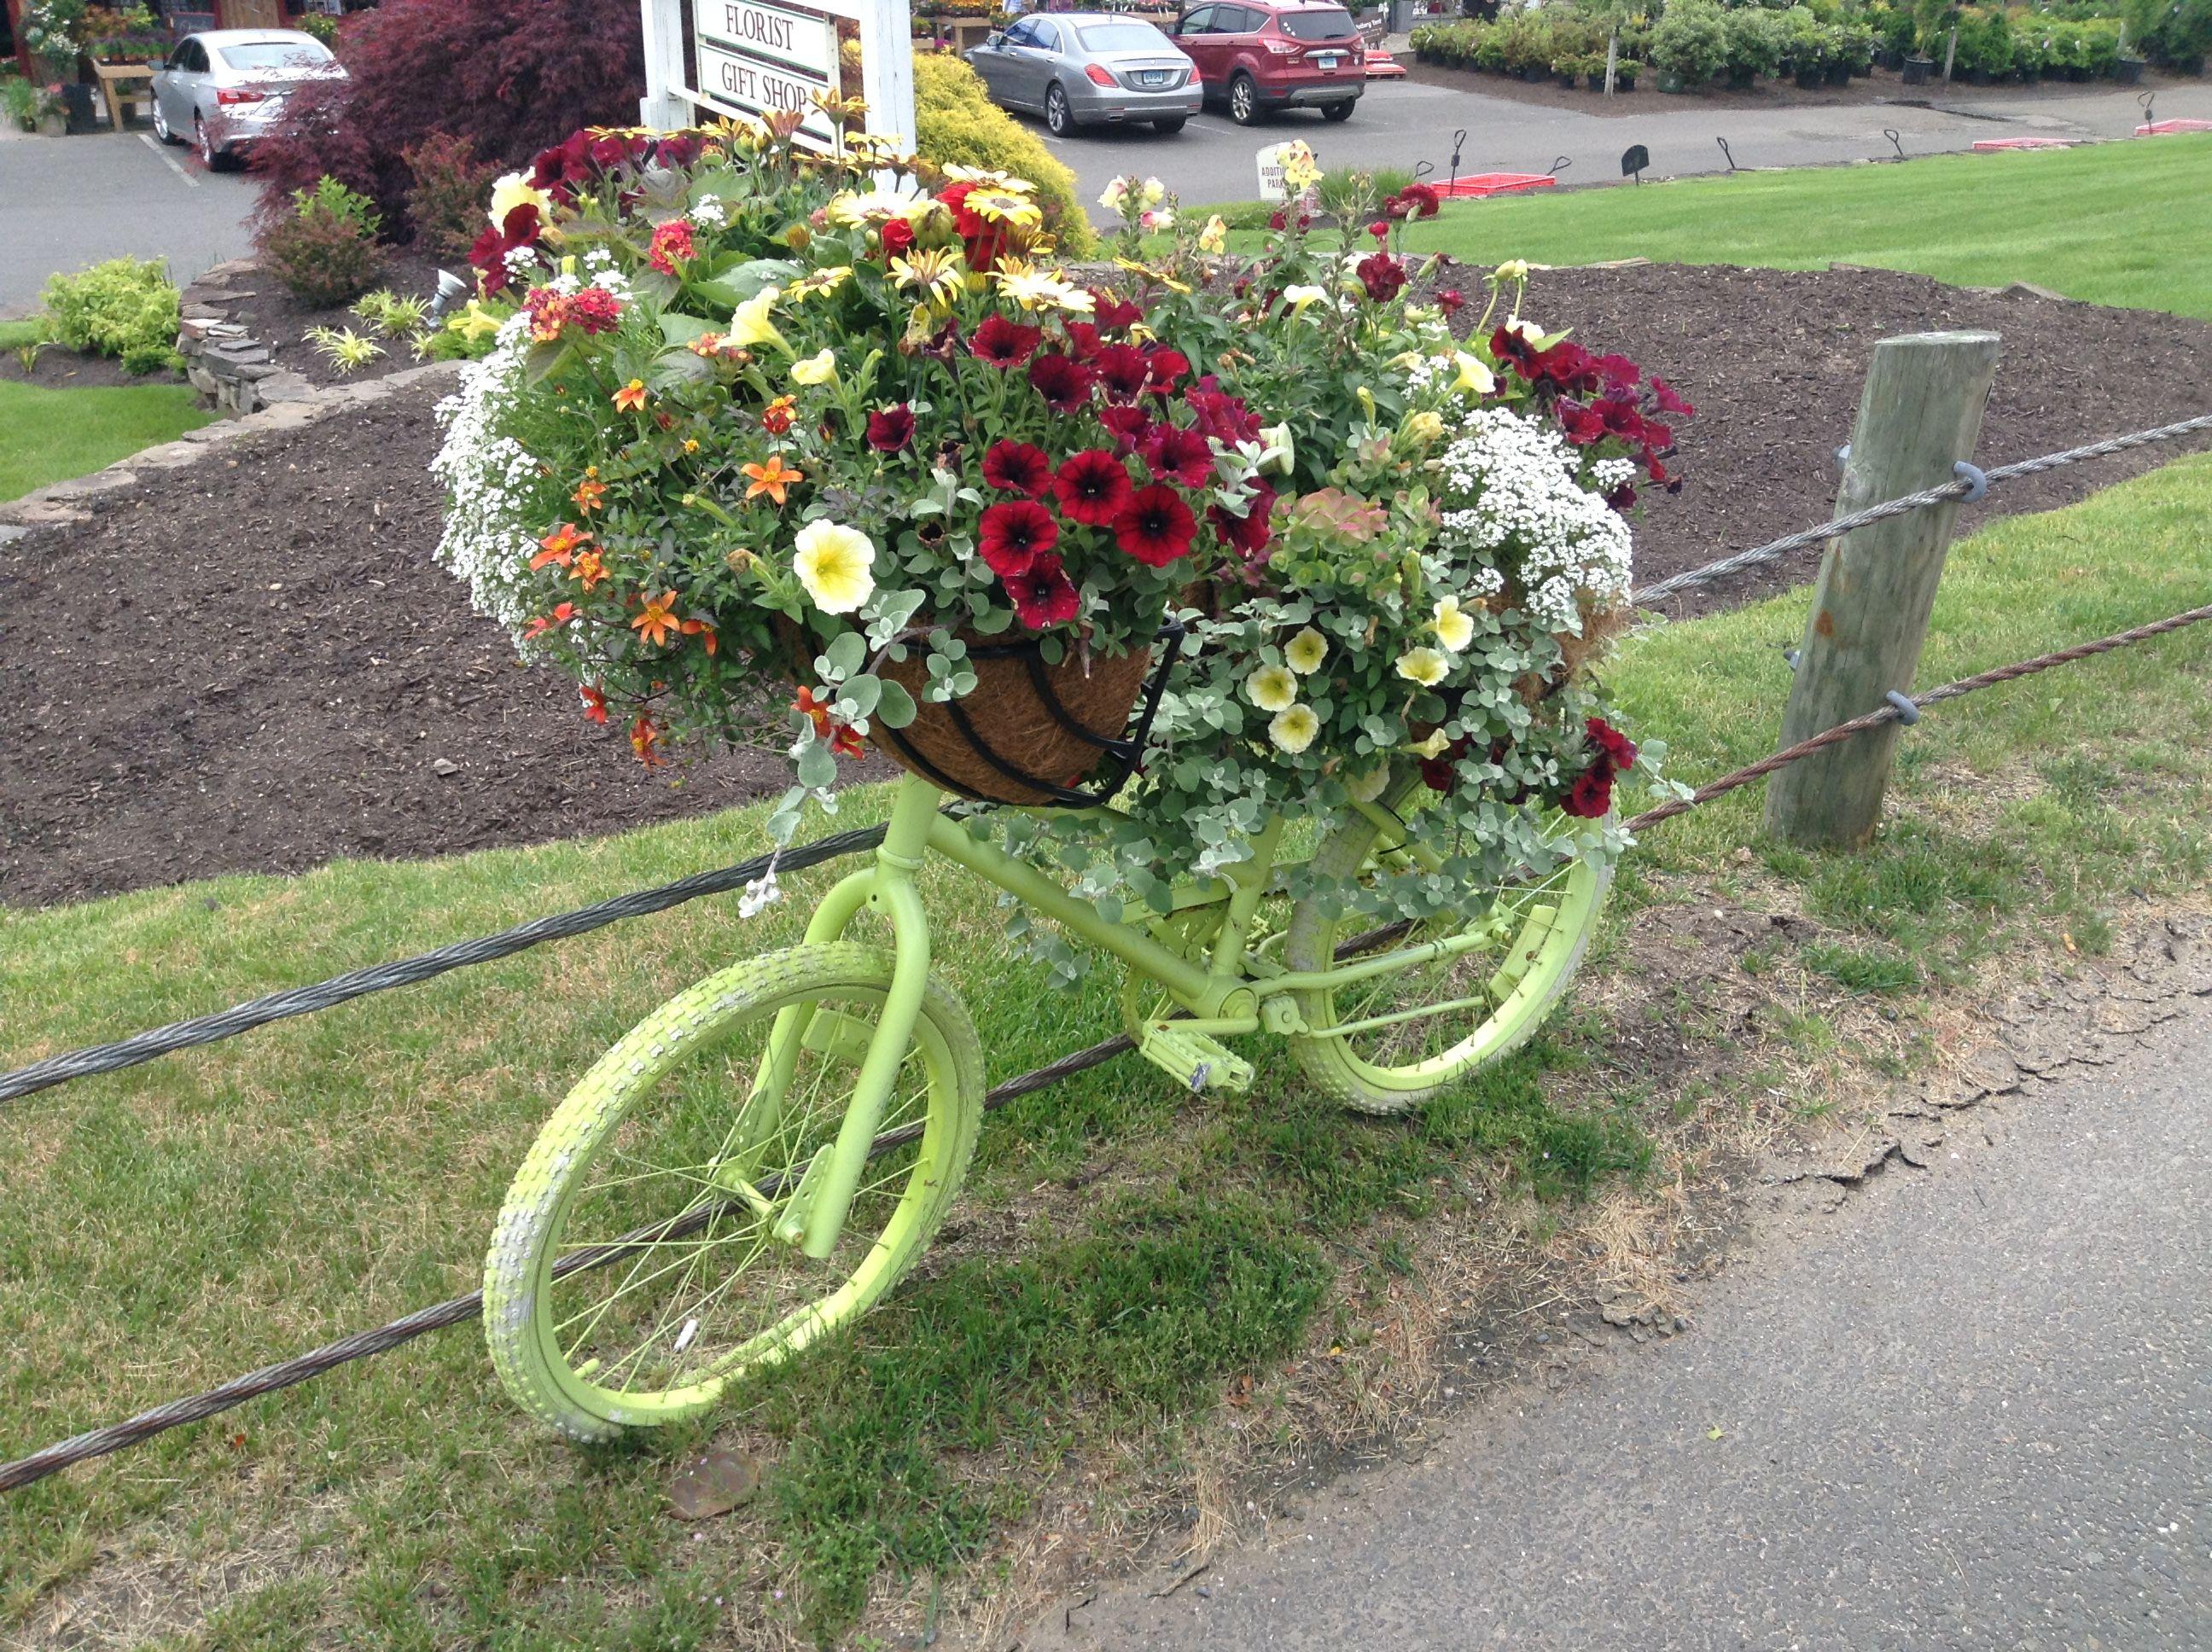 Garden decor bicycle  Pin by Riverside Nursery on Bikes  Pinterest